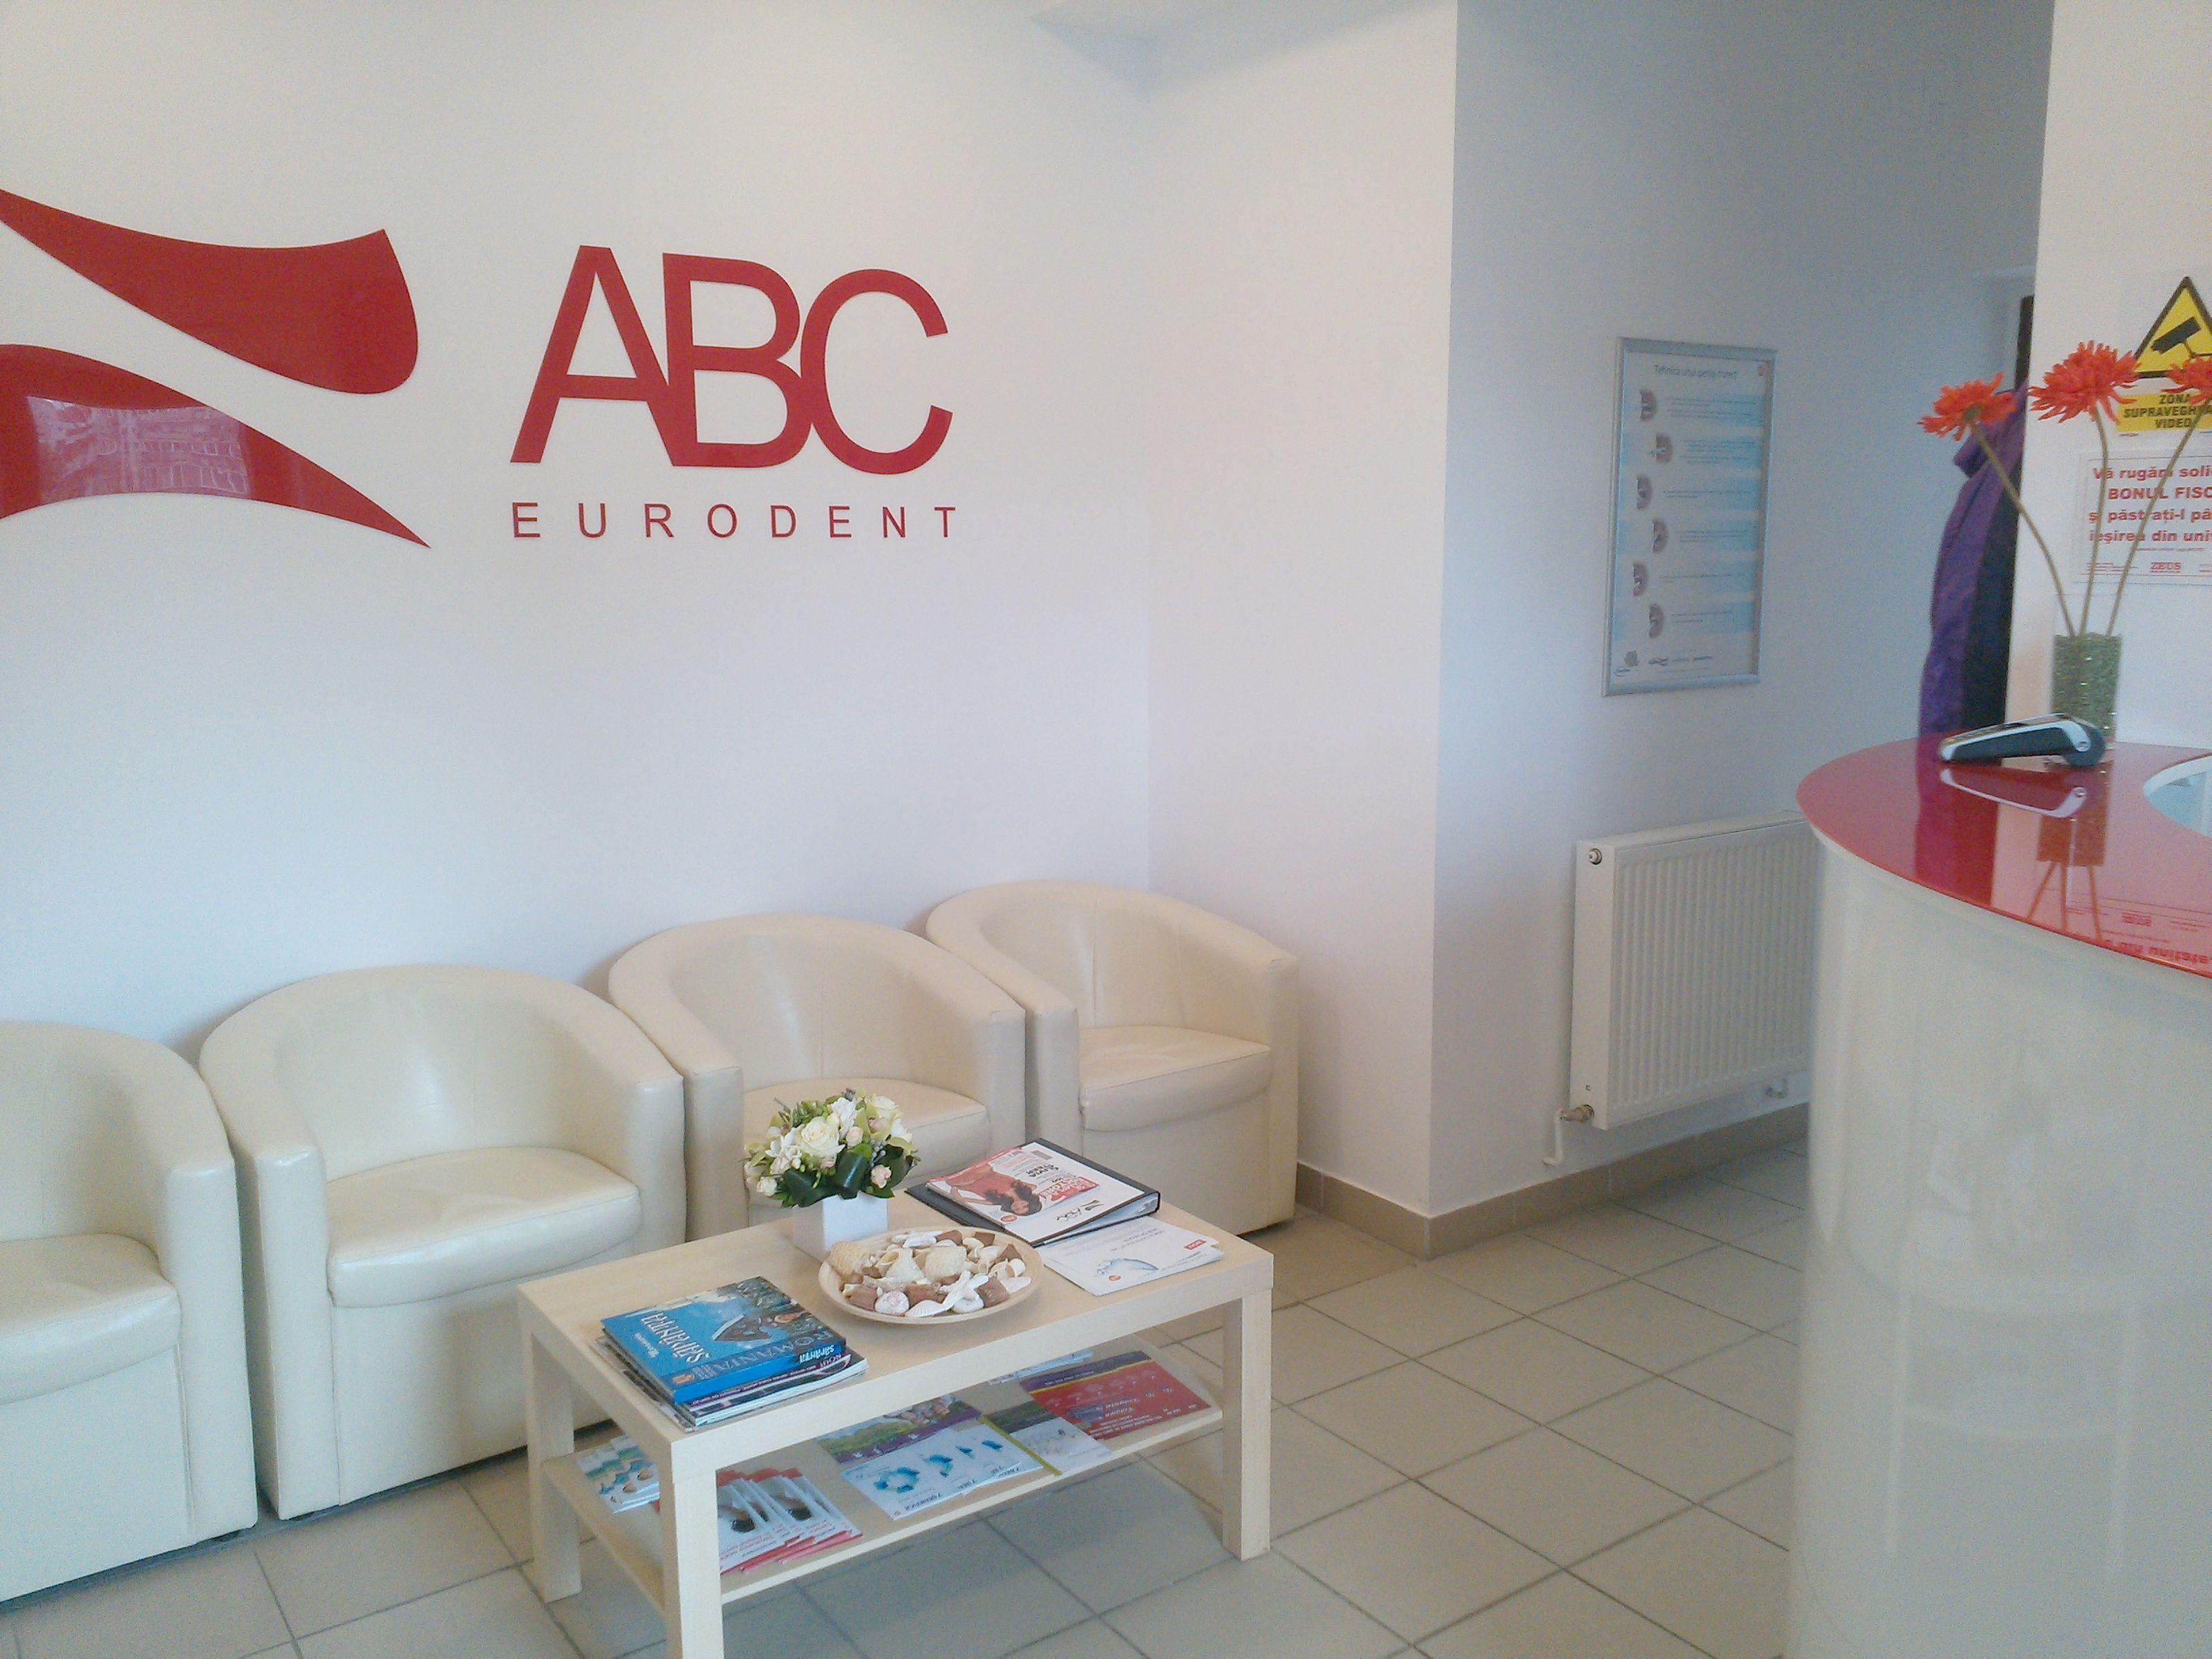 ABC Eurodent poza 11